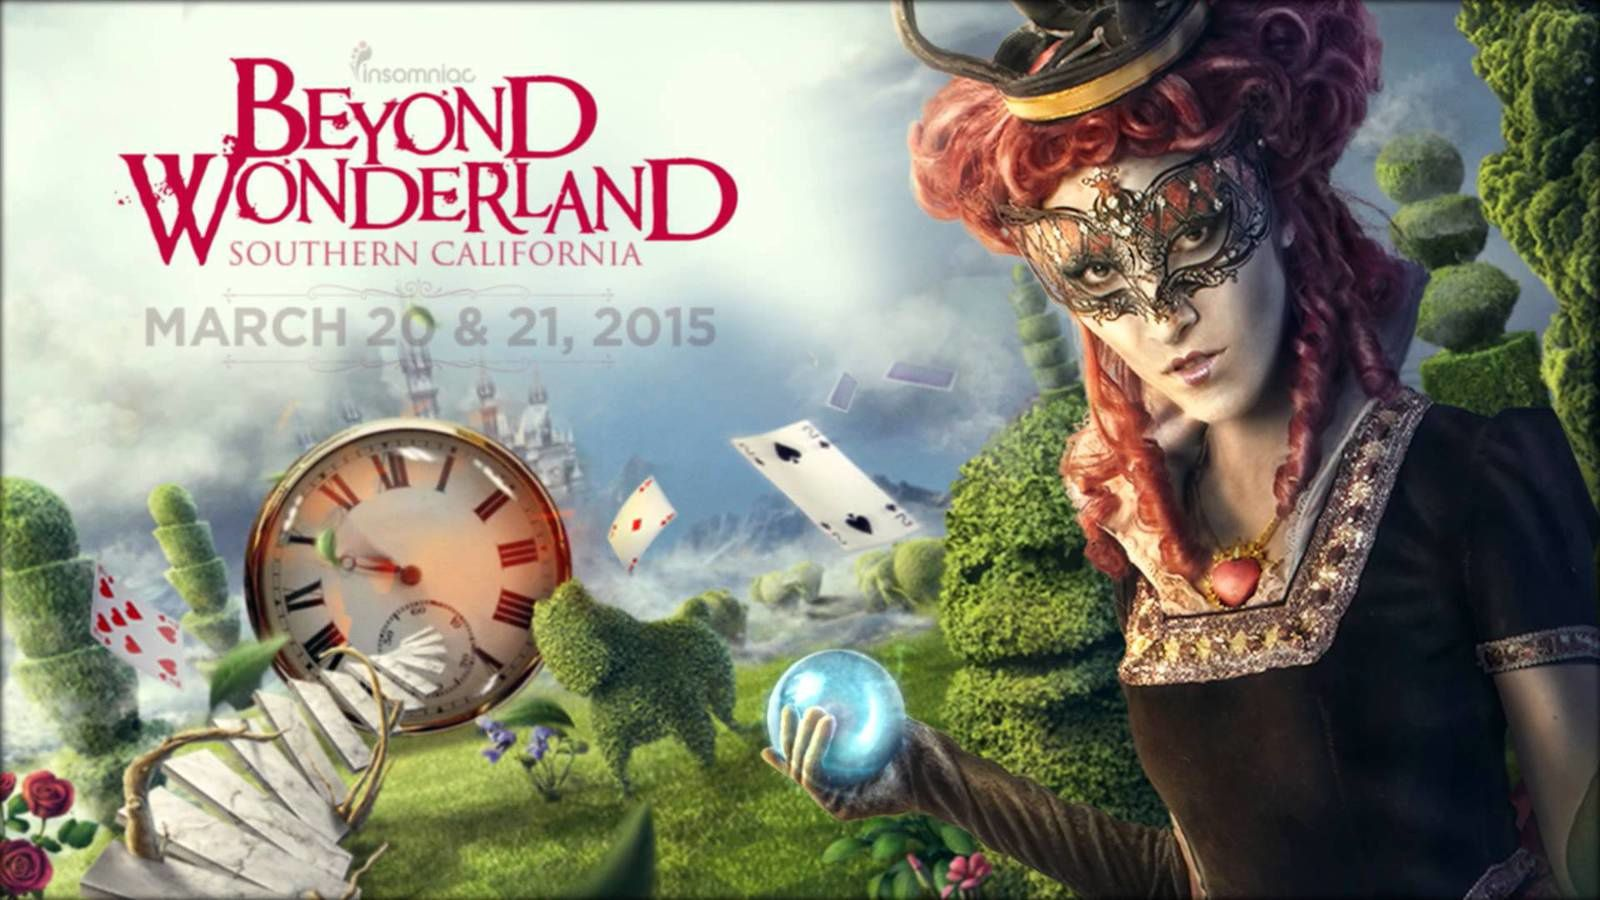 Tiësto tracklist and mp3 | Beyond Wonderland | San Bernardino, CA - march 20, 2015